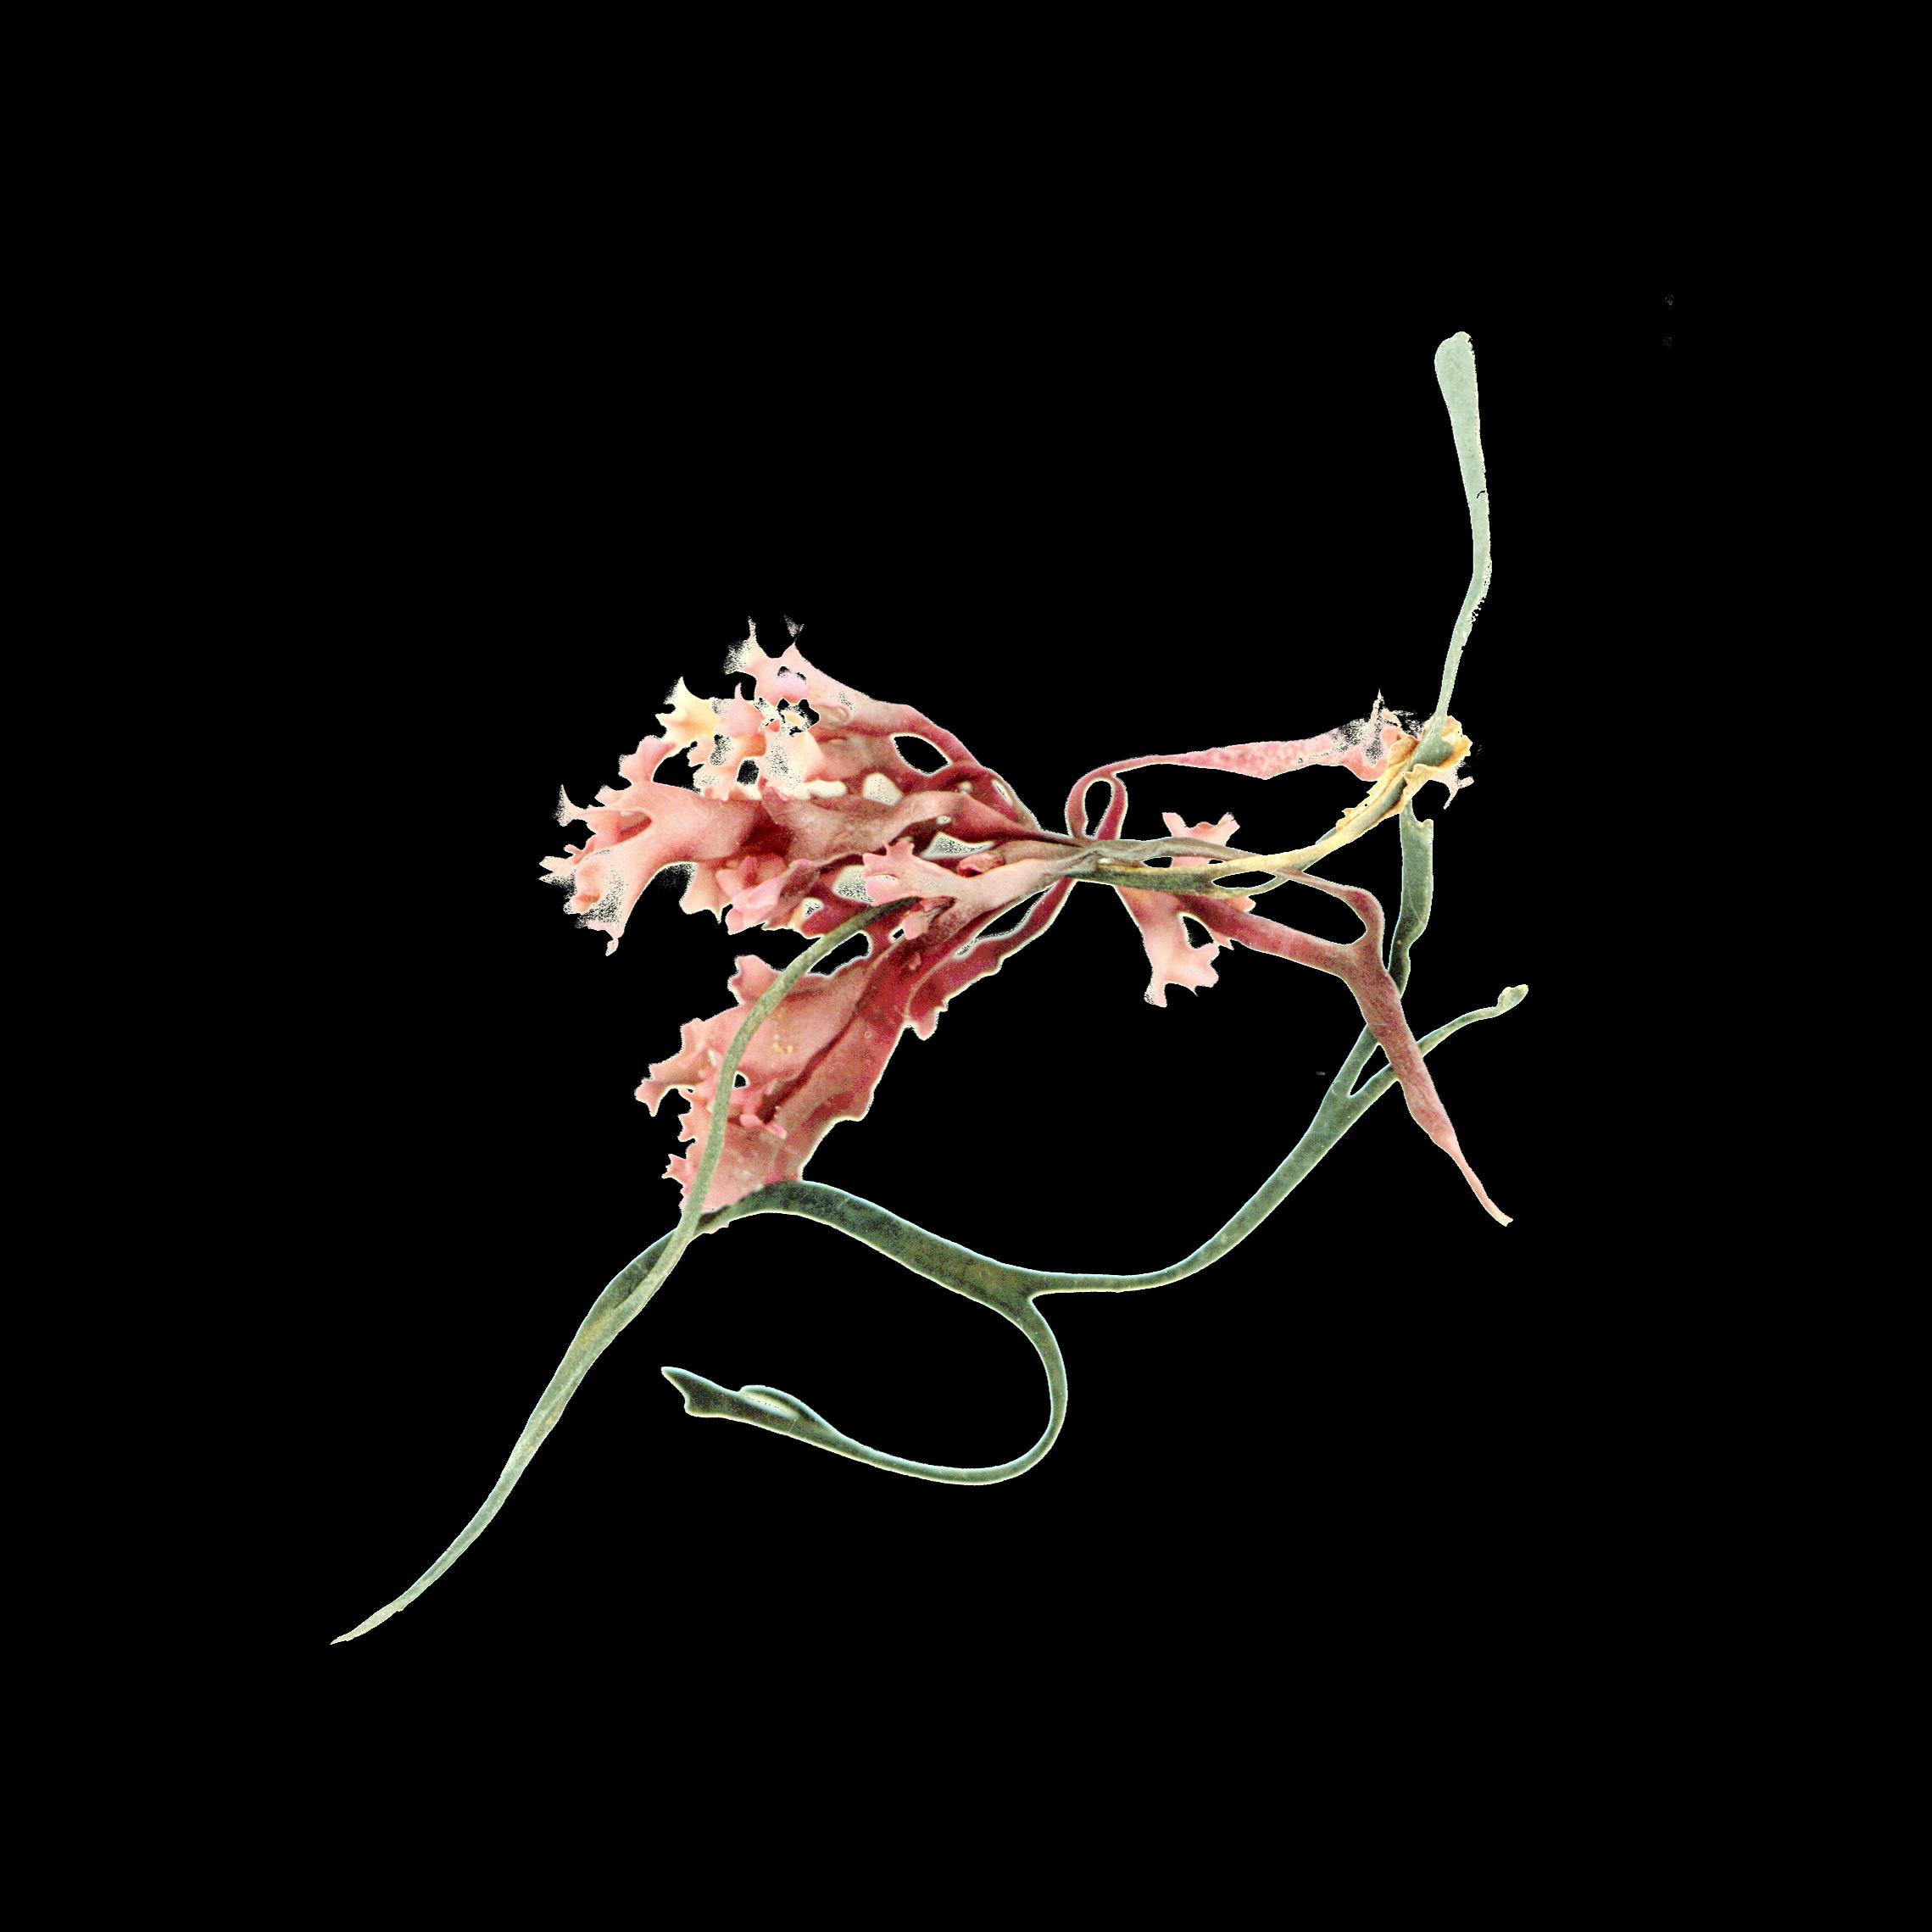 Linda Briskin_aqua botanica (ii).jpg